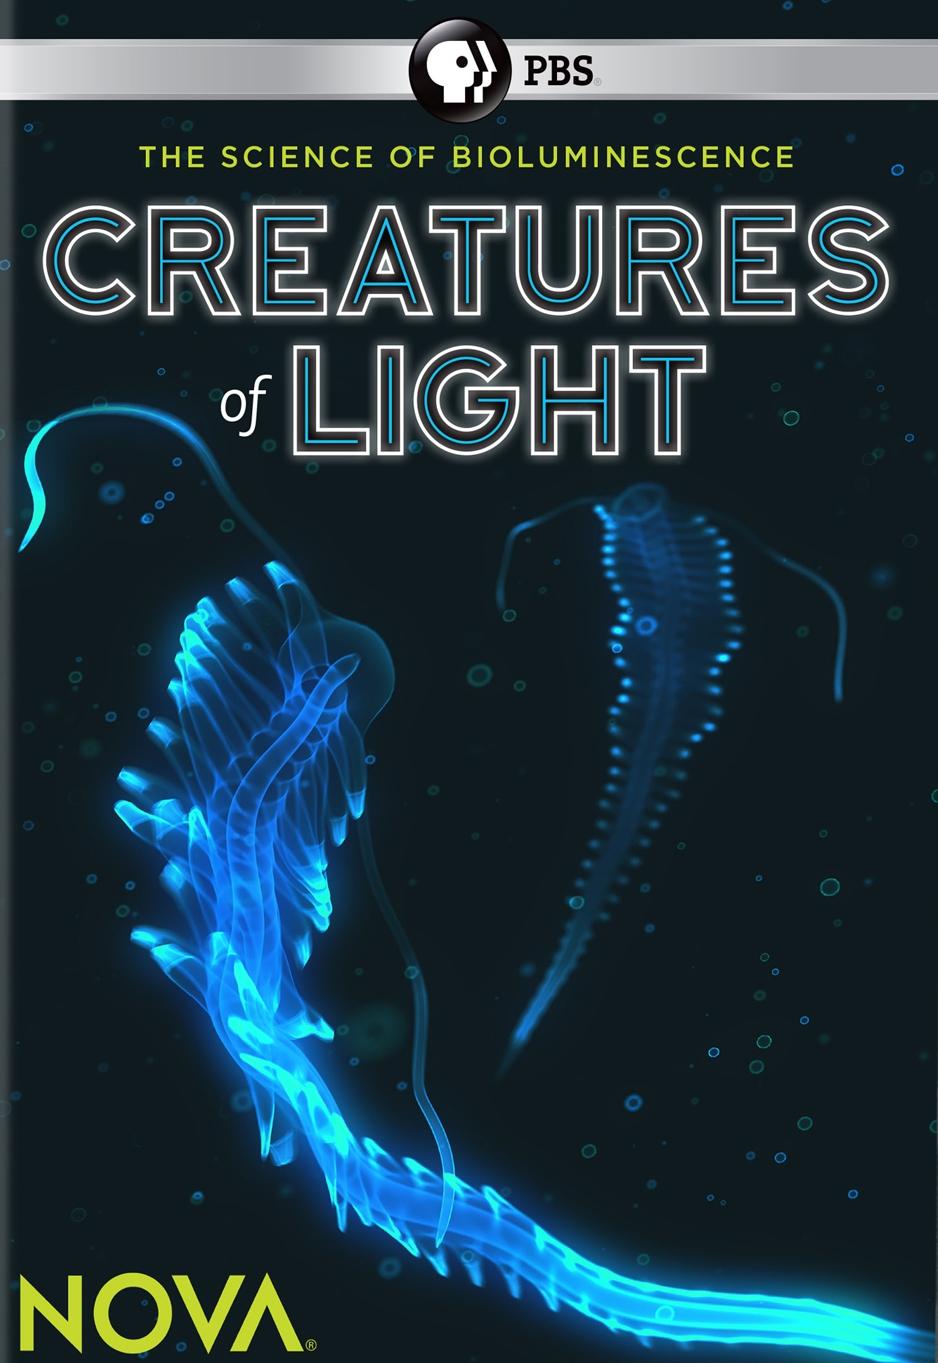 NOVA: Creatures of Light